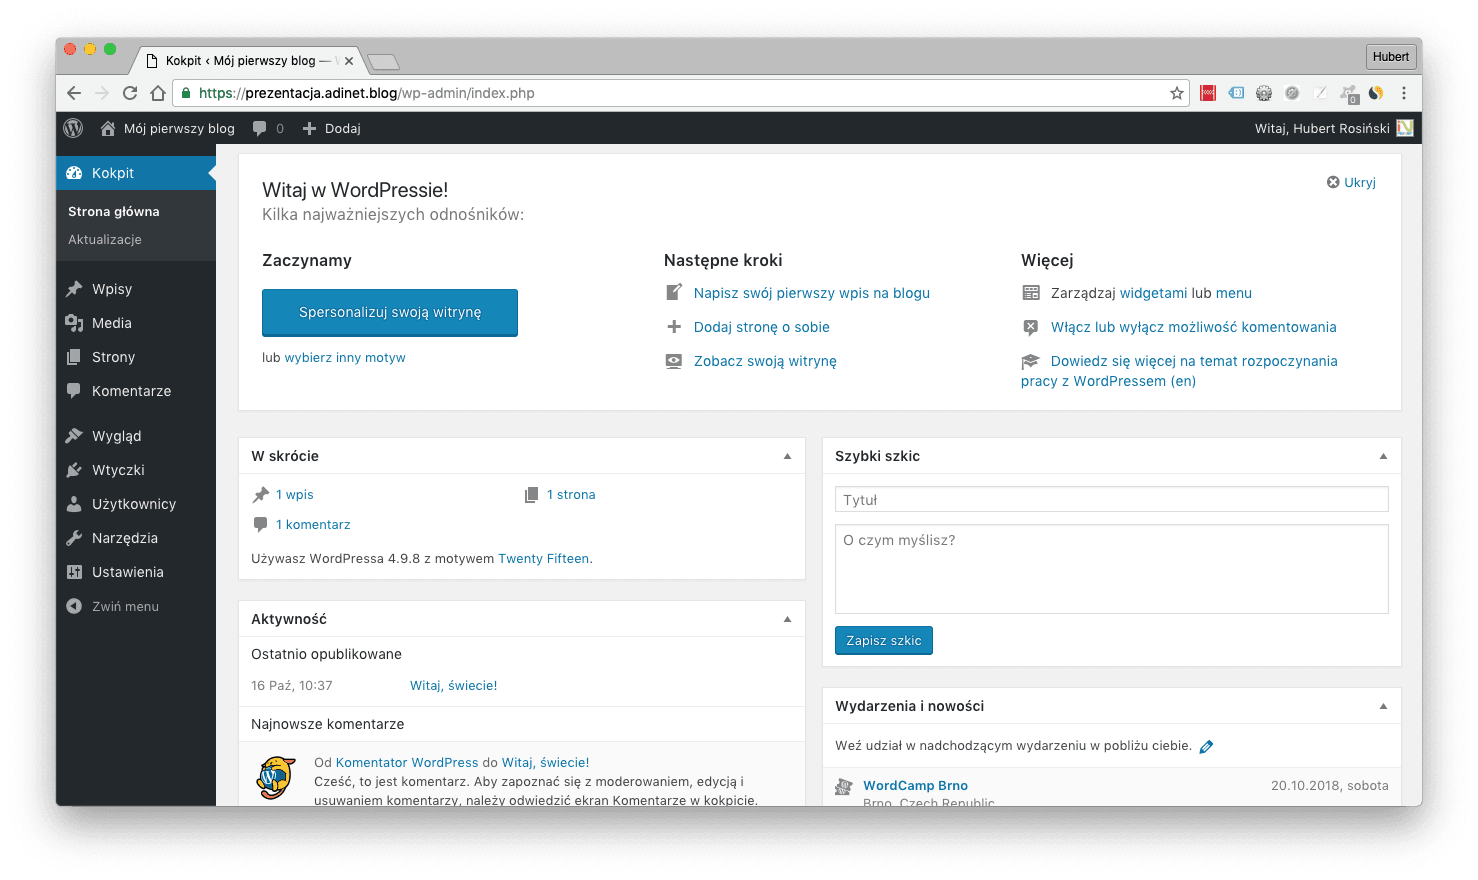 Wpis Panel Administracyjny - zrzut ekranu kokpitu WordPressa.